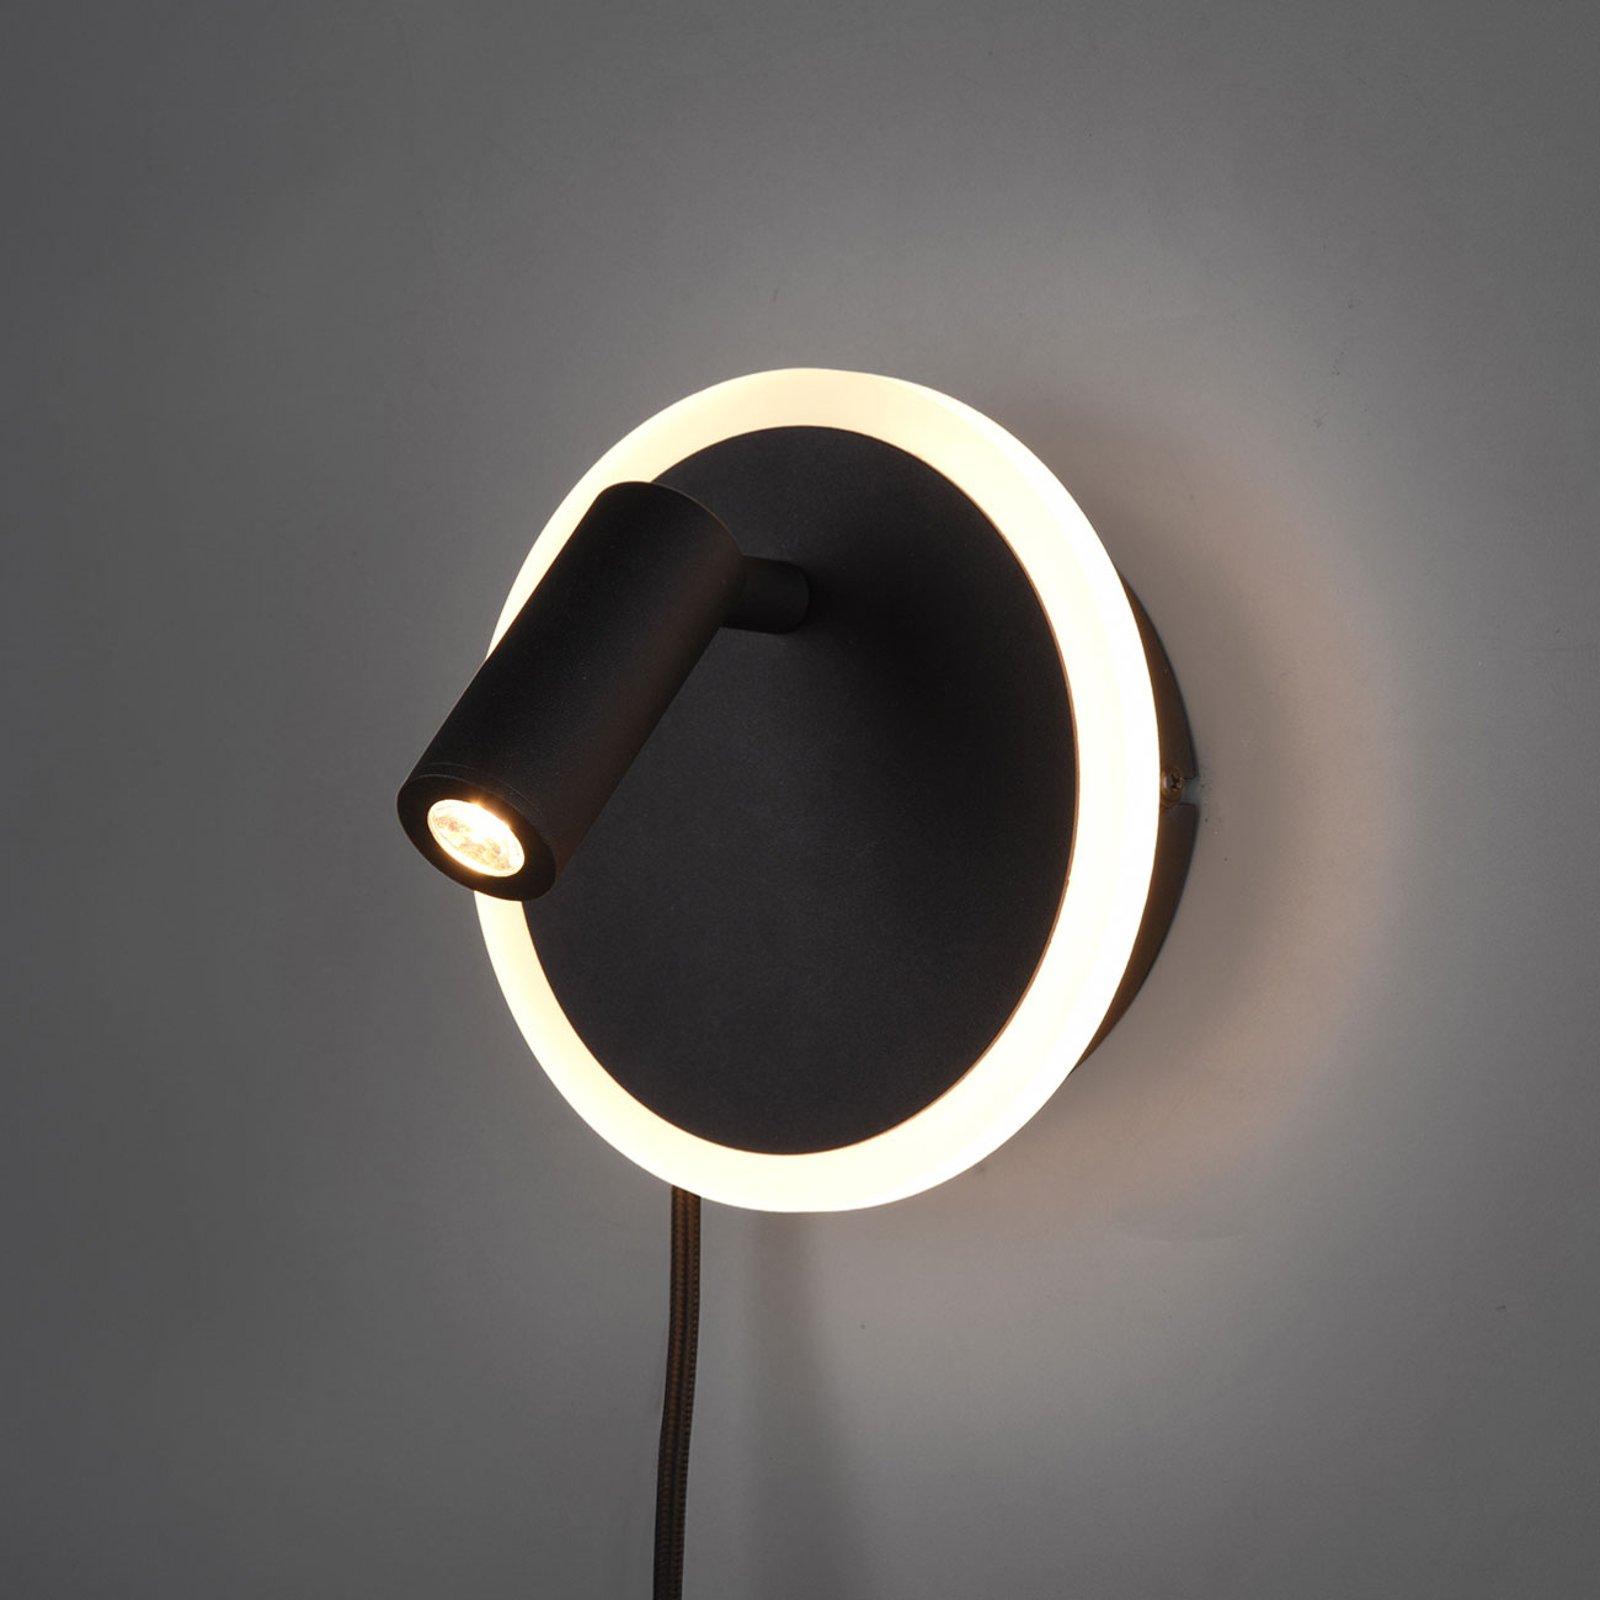 LED-vegglampe Jordan, 2 lyskilder, svart